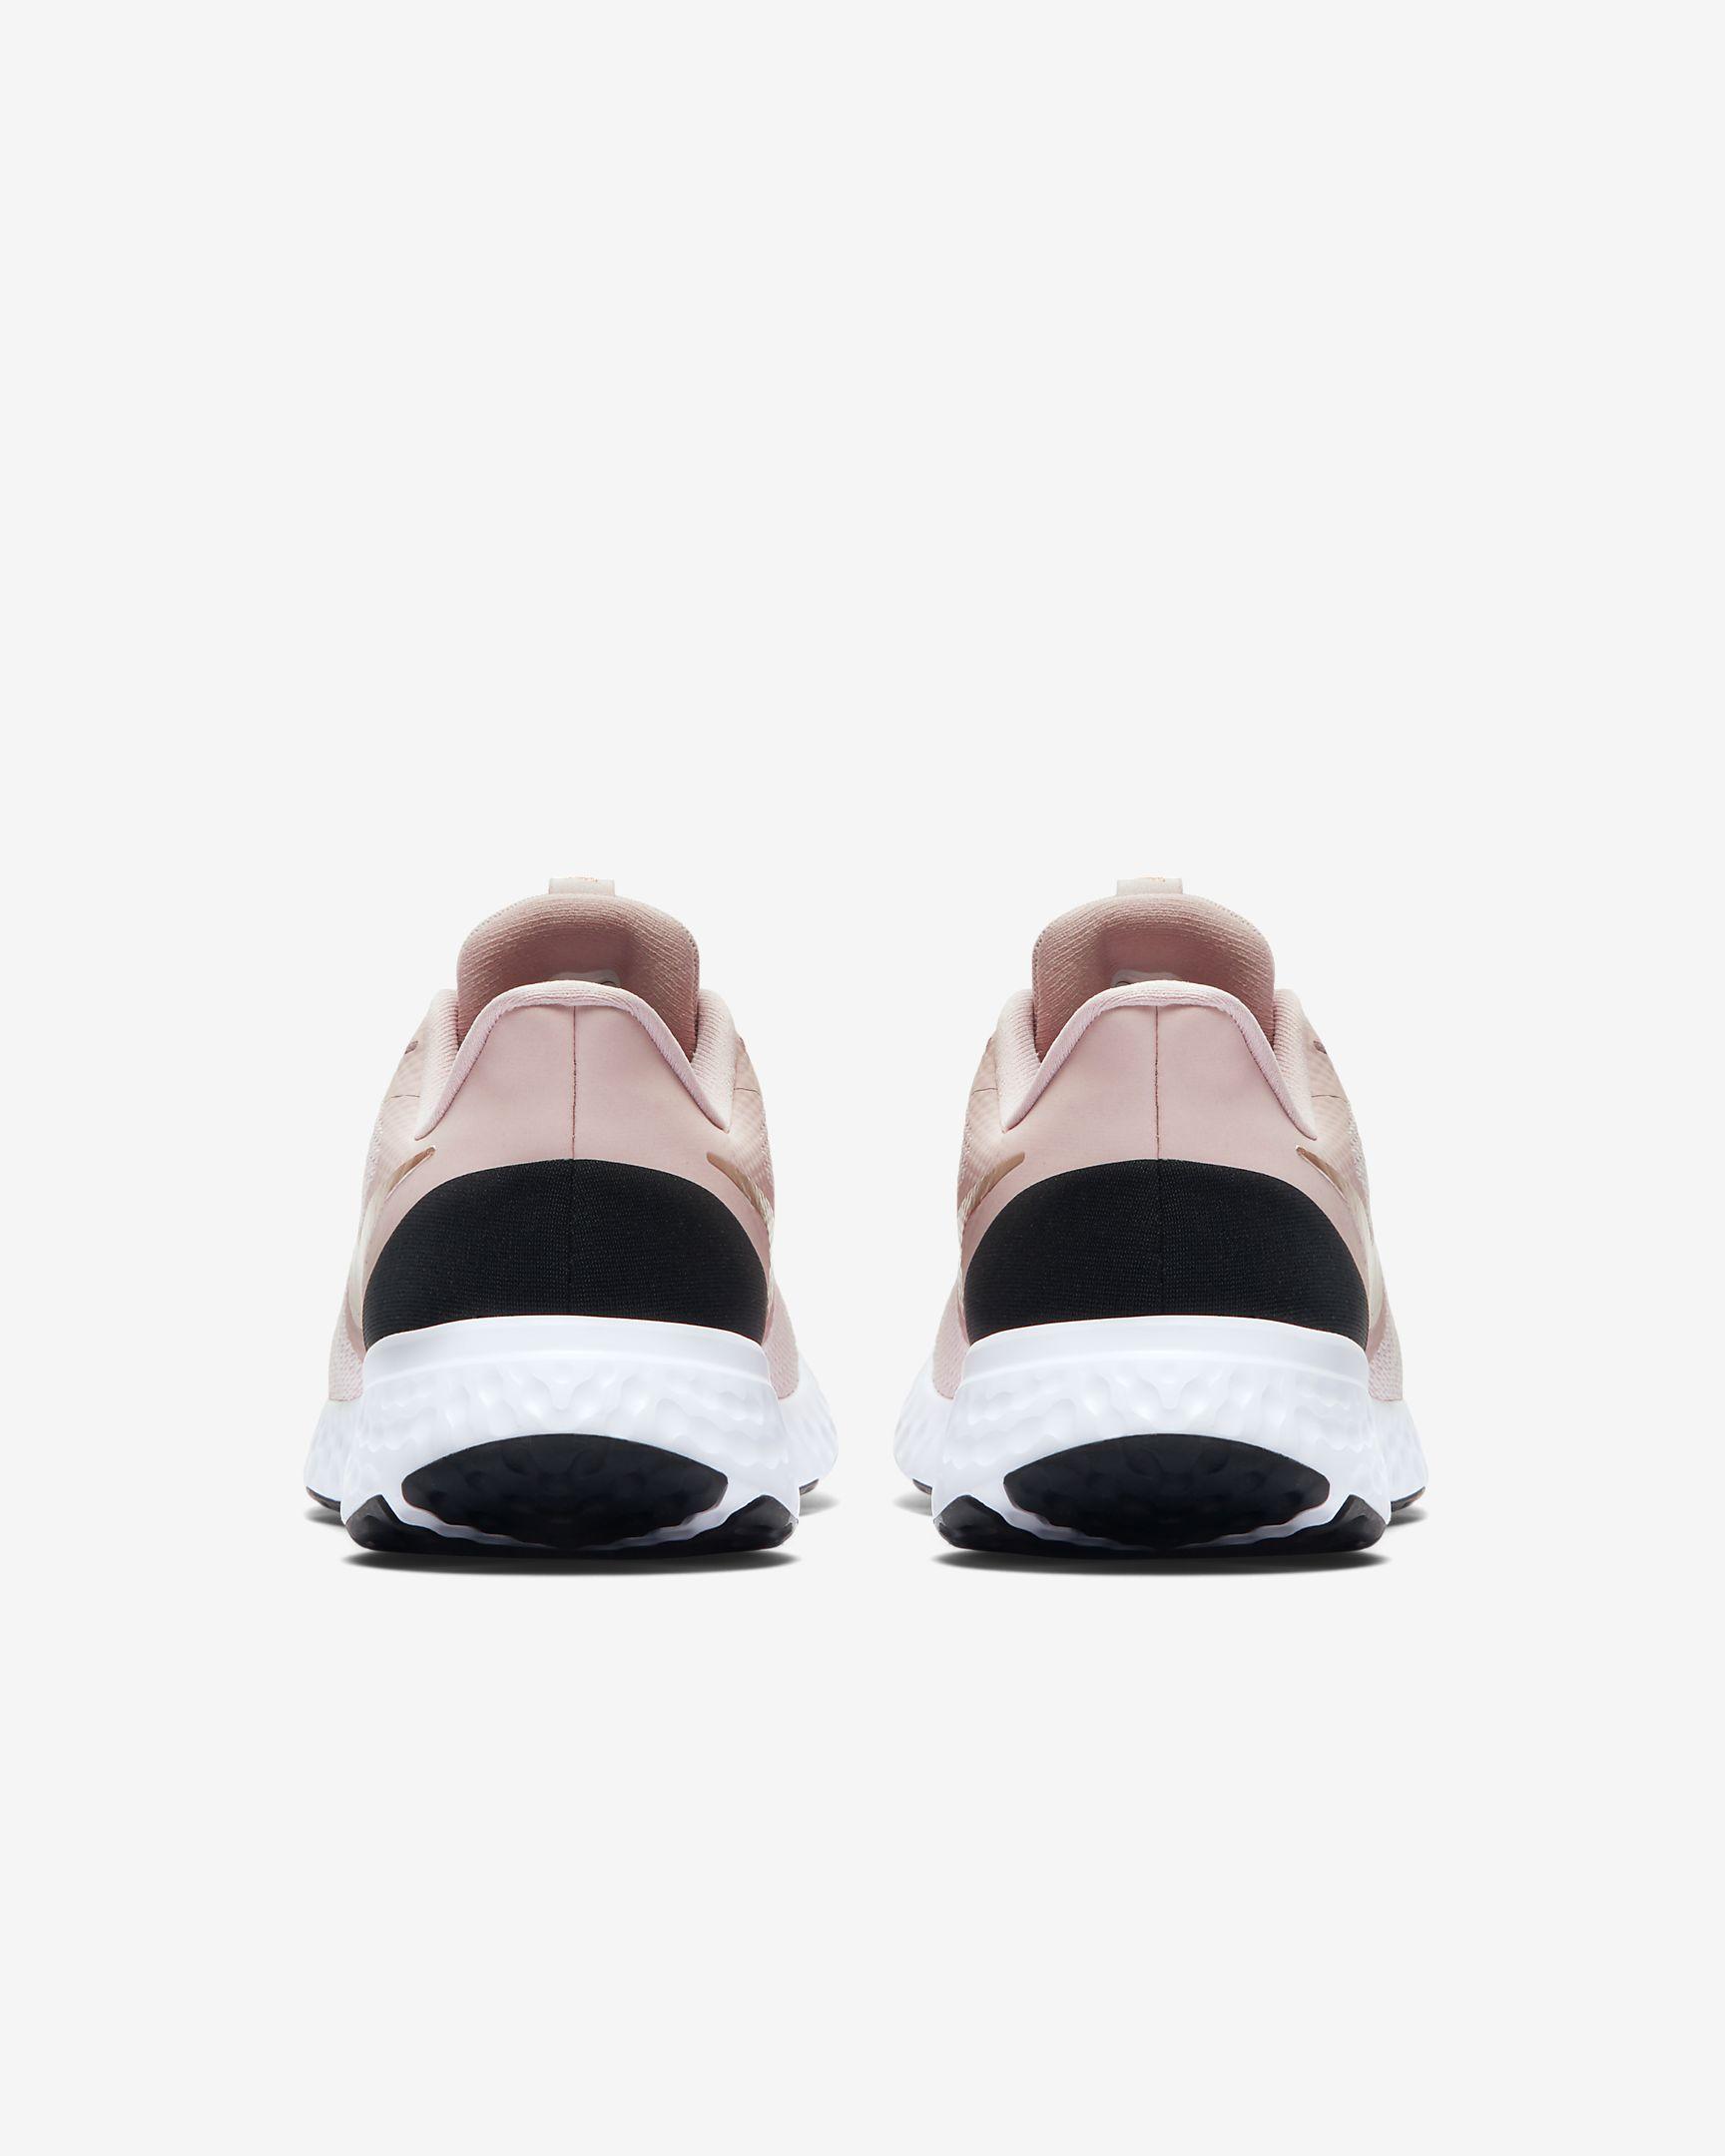 Giày thể thao nữ Nike Revolution 5 W BQ3207-600